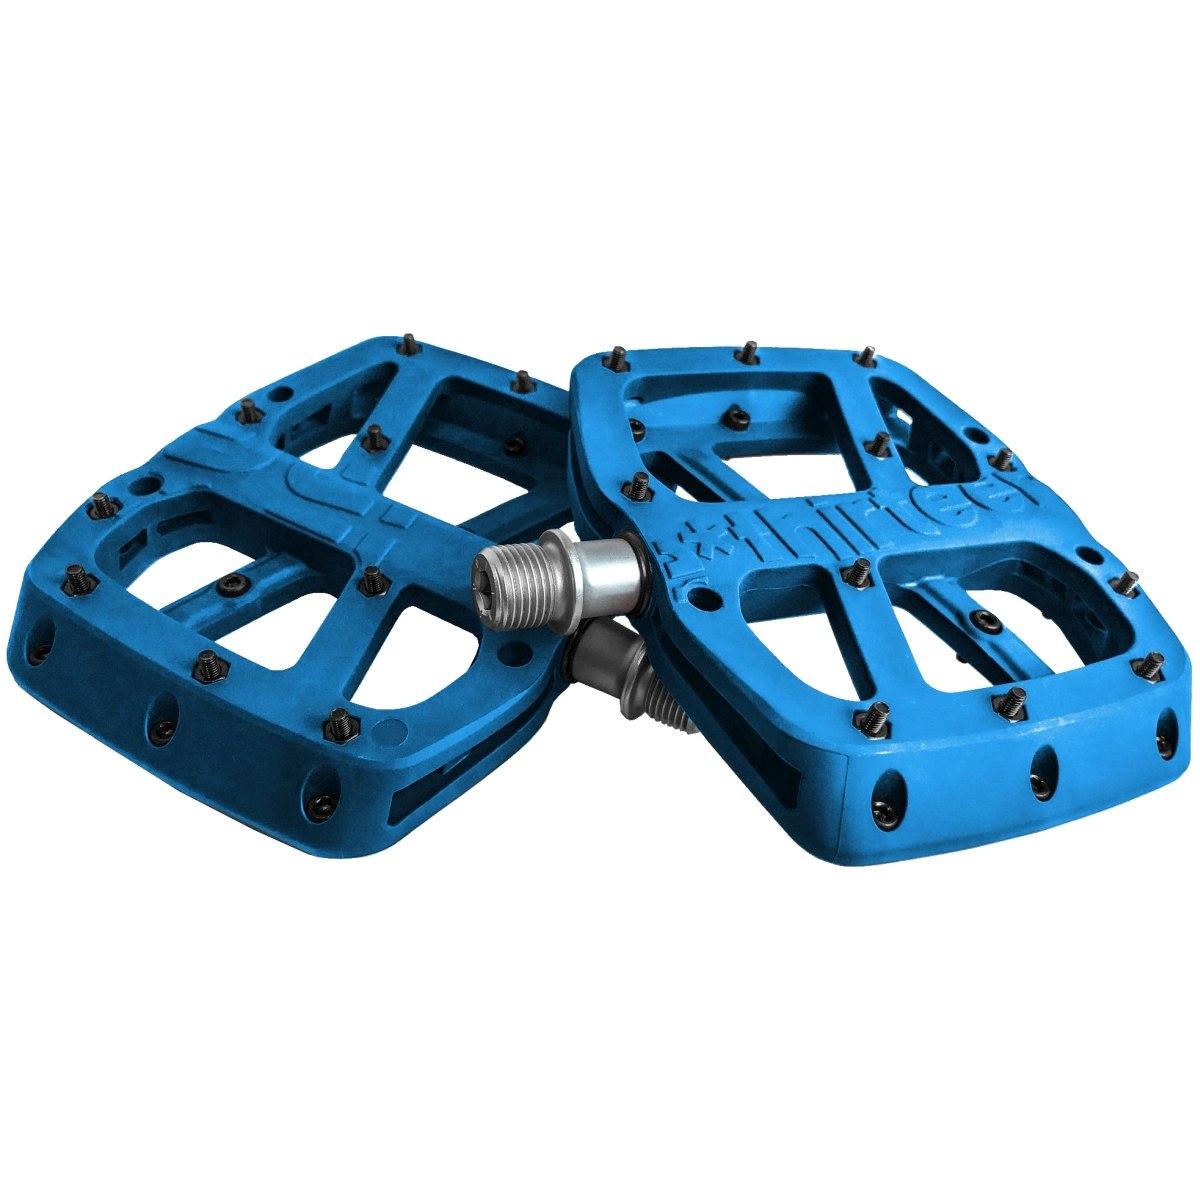 e*thirteen Base Flat Pedal - blue